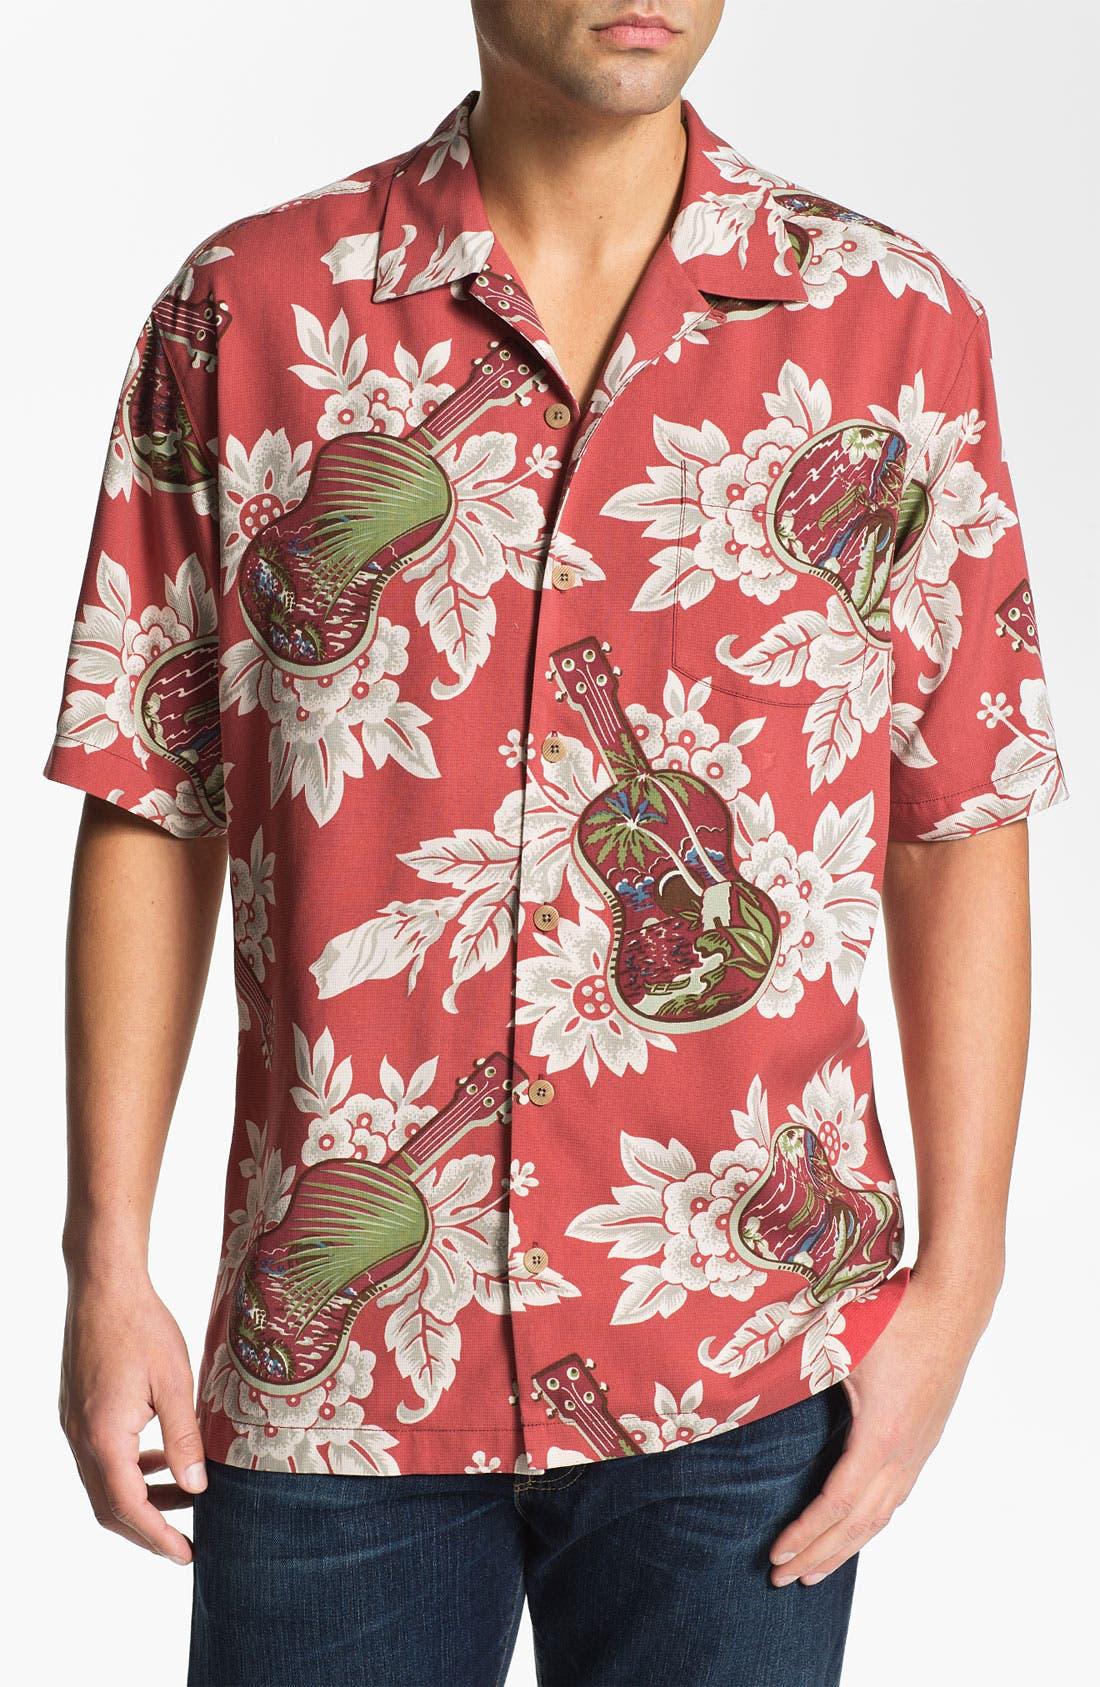 Alternate Image 1 Selected - Tommy Bahama 'Island Jams' Silk Campshirt